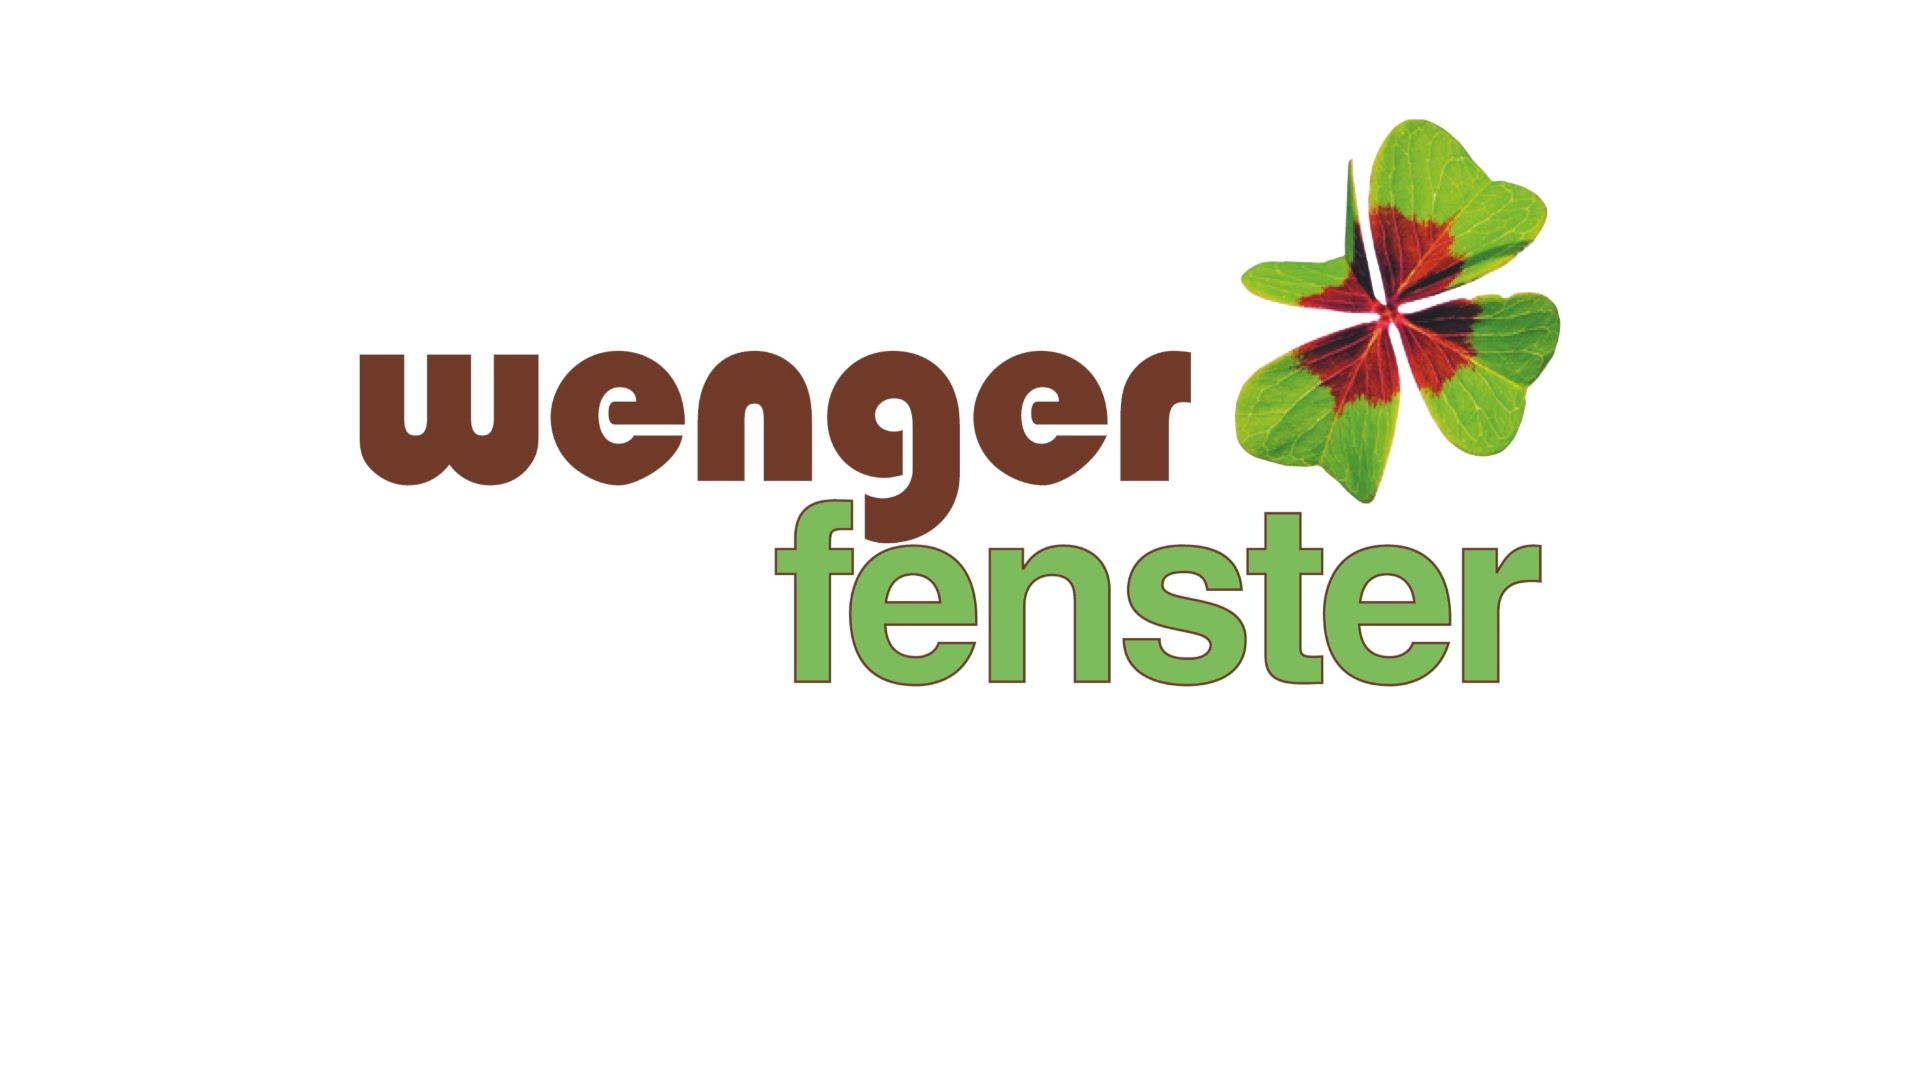 http://industrienacht.ch/wp-content/uploads/2017/06/Wenger-Fenster.jpg